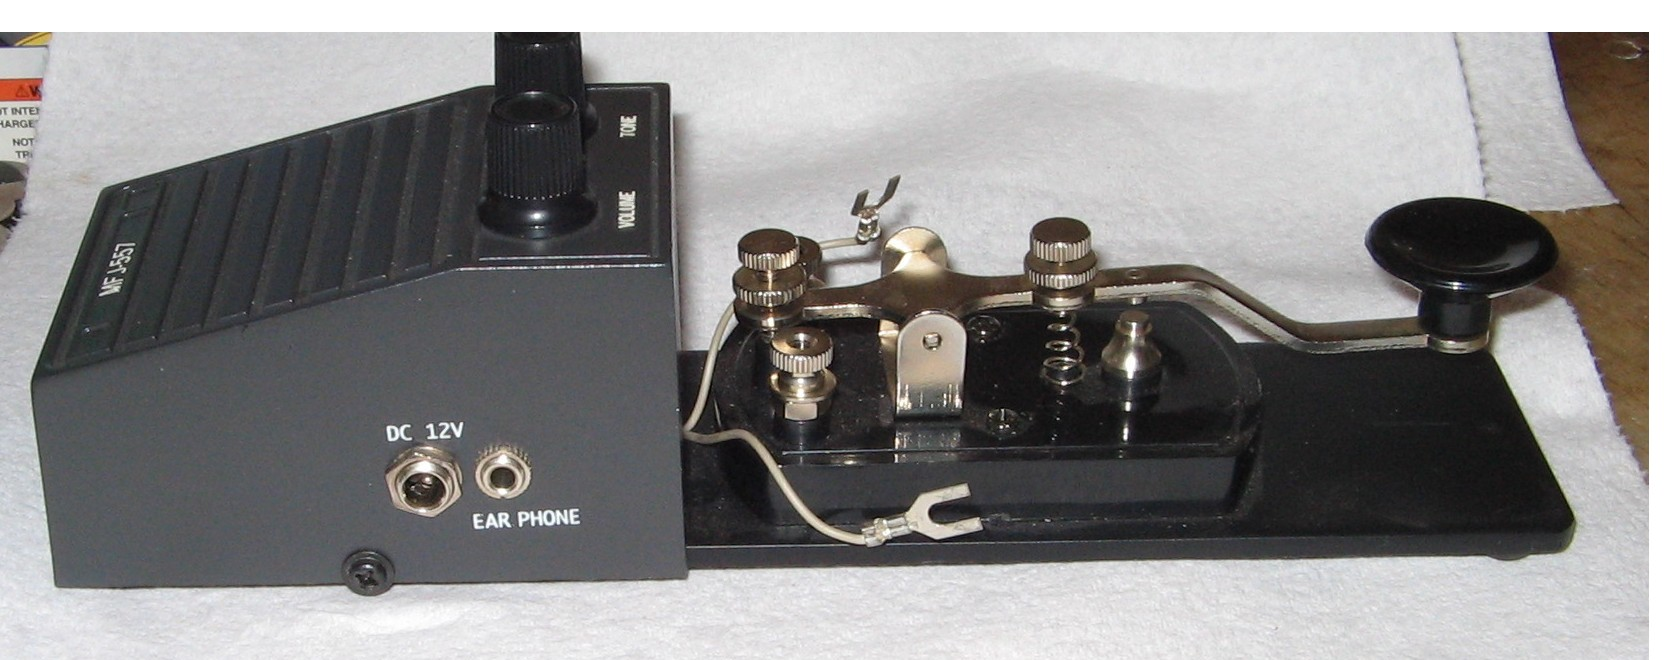 MFJ-557 Code Oscillator With Key.JPG